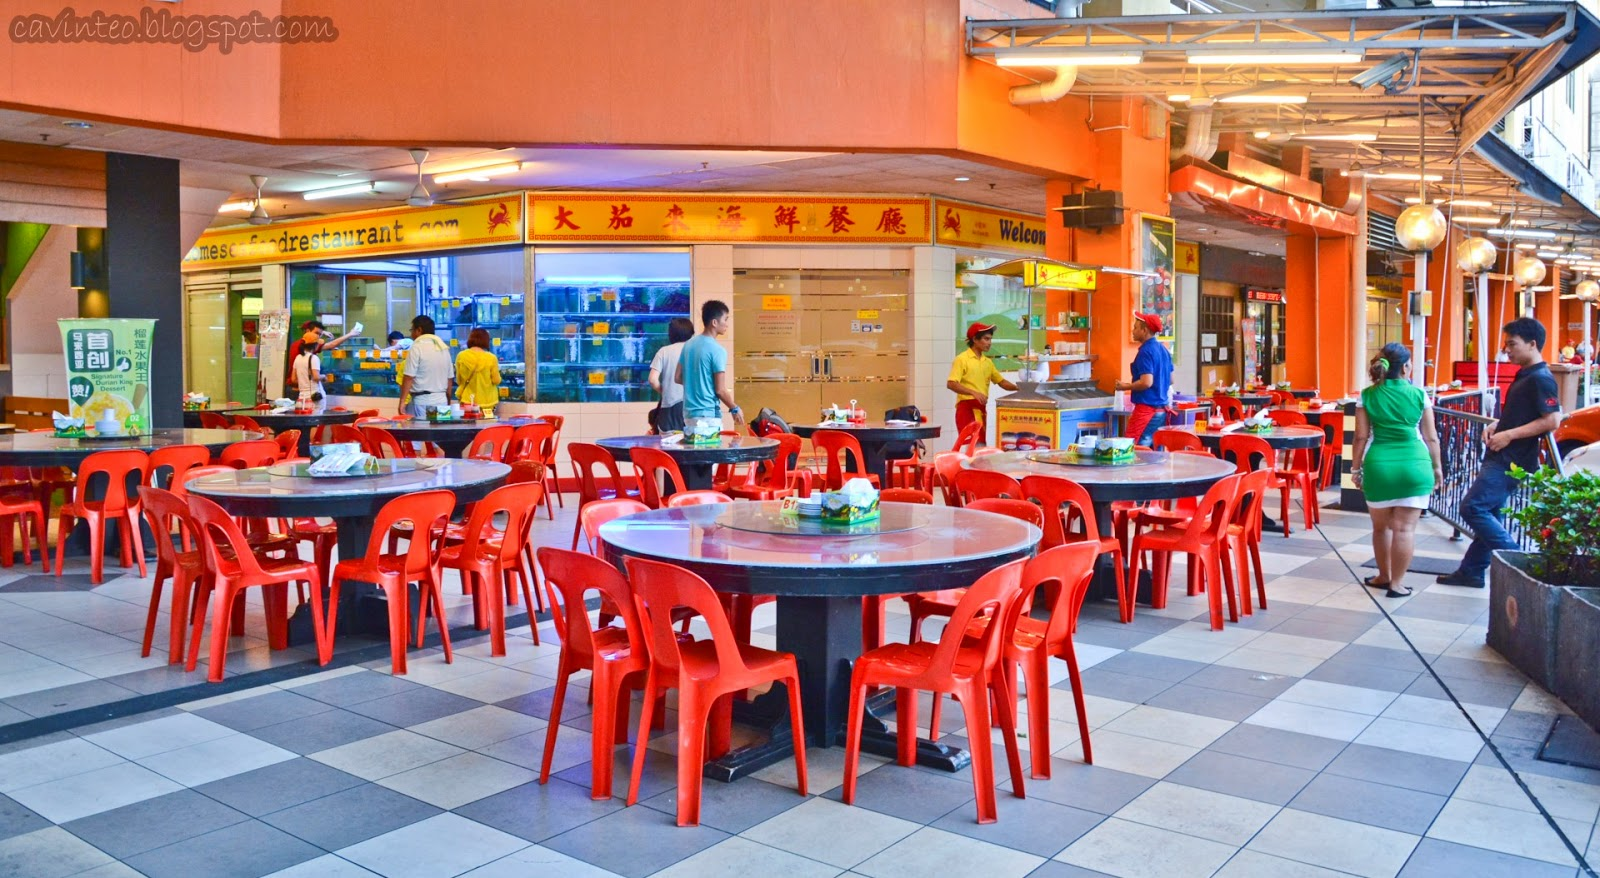 Entree kibbles welcome seafood restaurant 大茄来海鲜餐厅